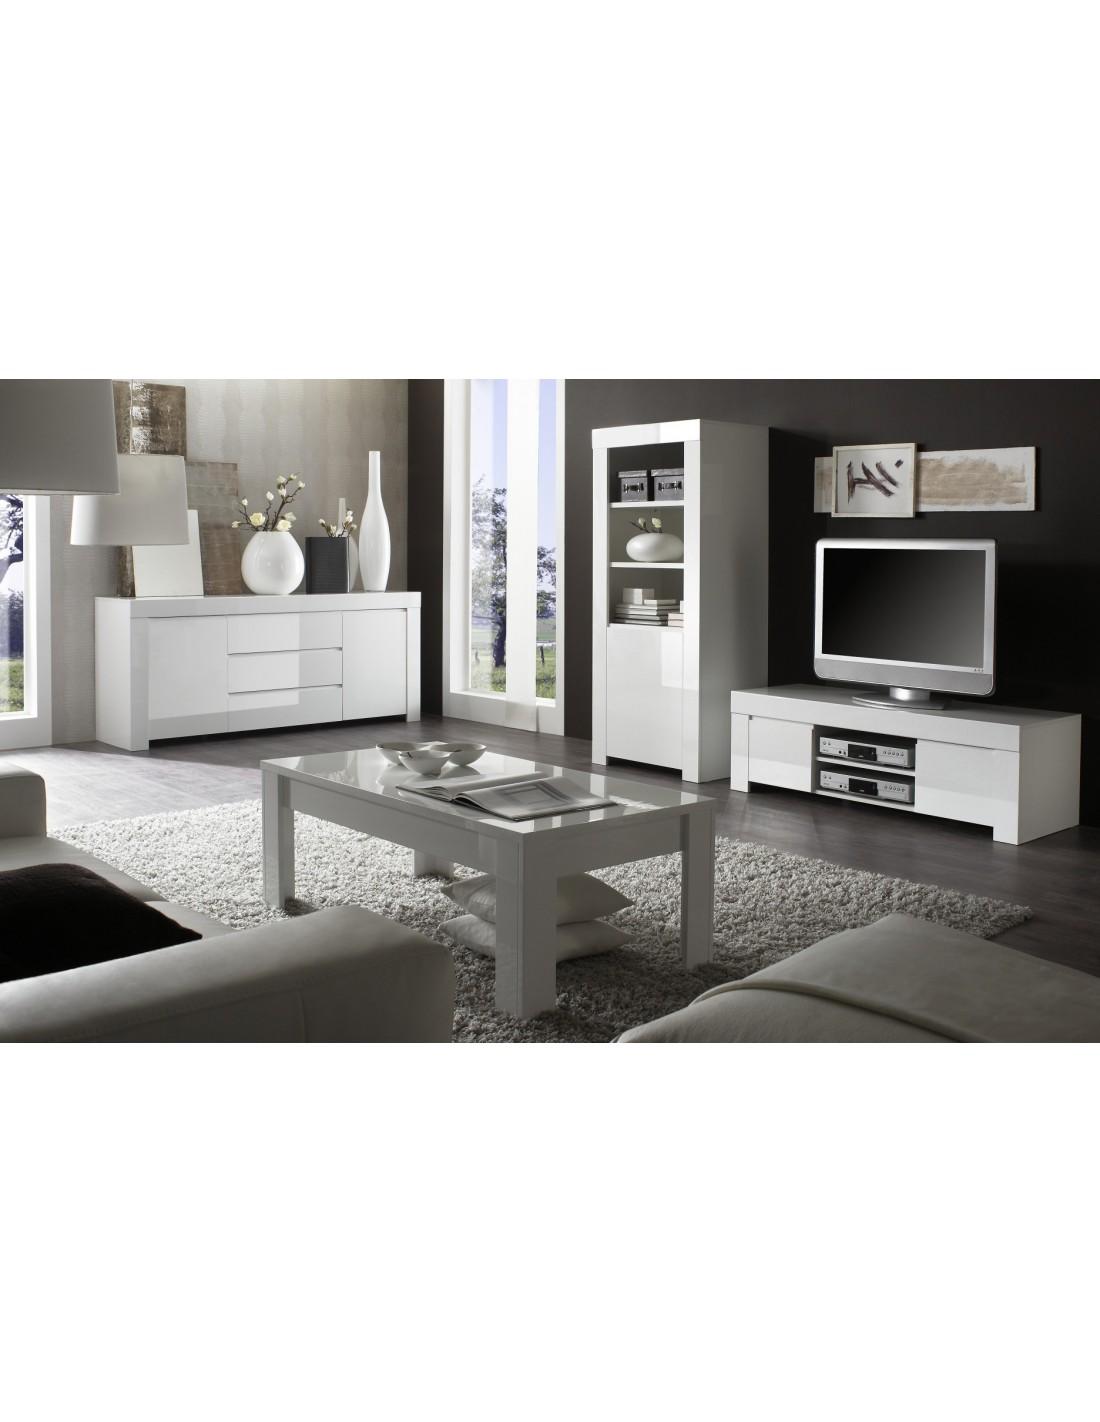 Meuble Tv Laque Blanc Amalfi